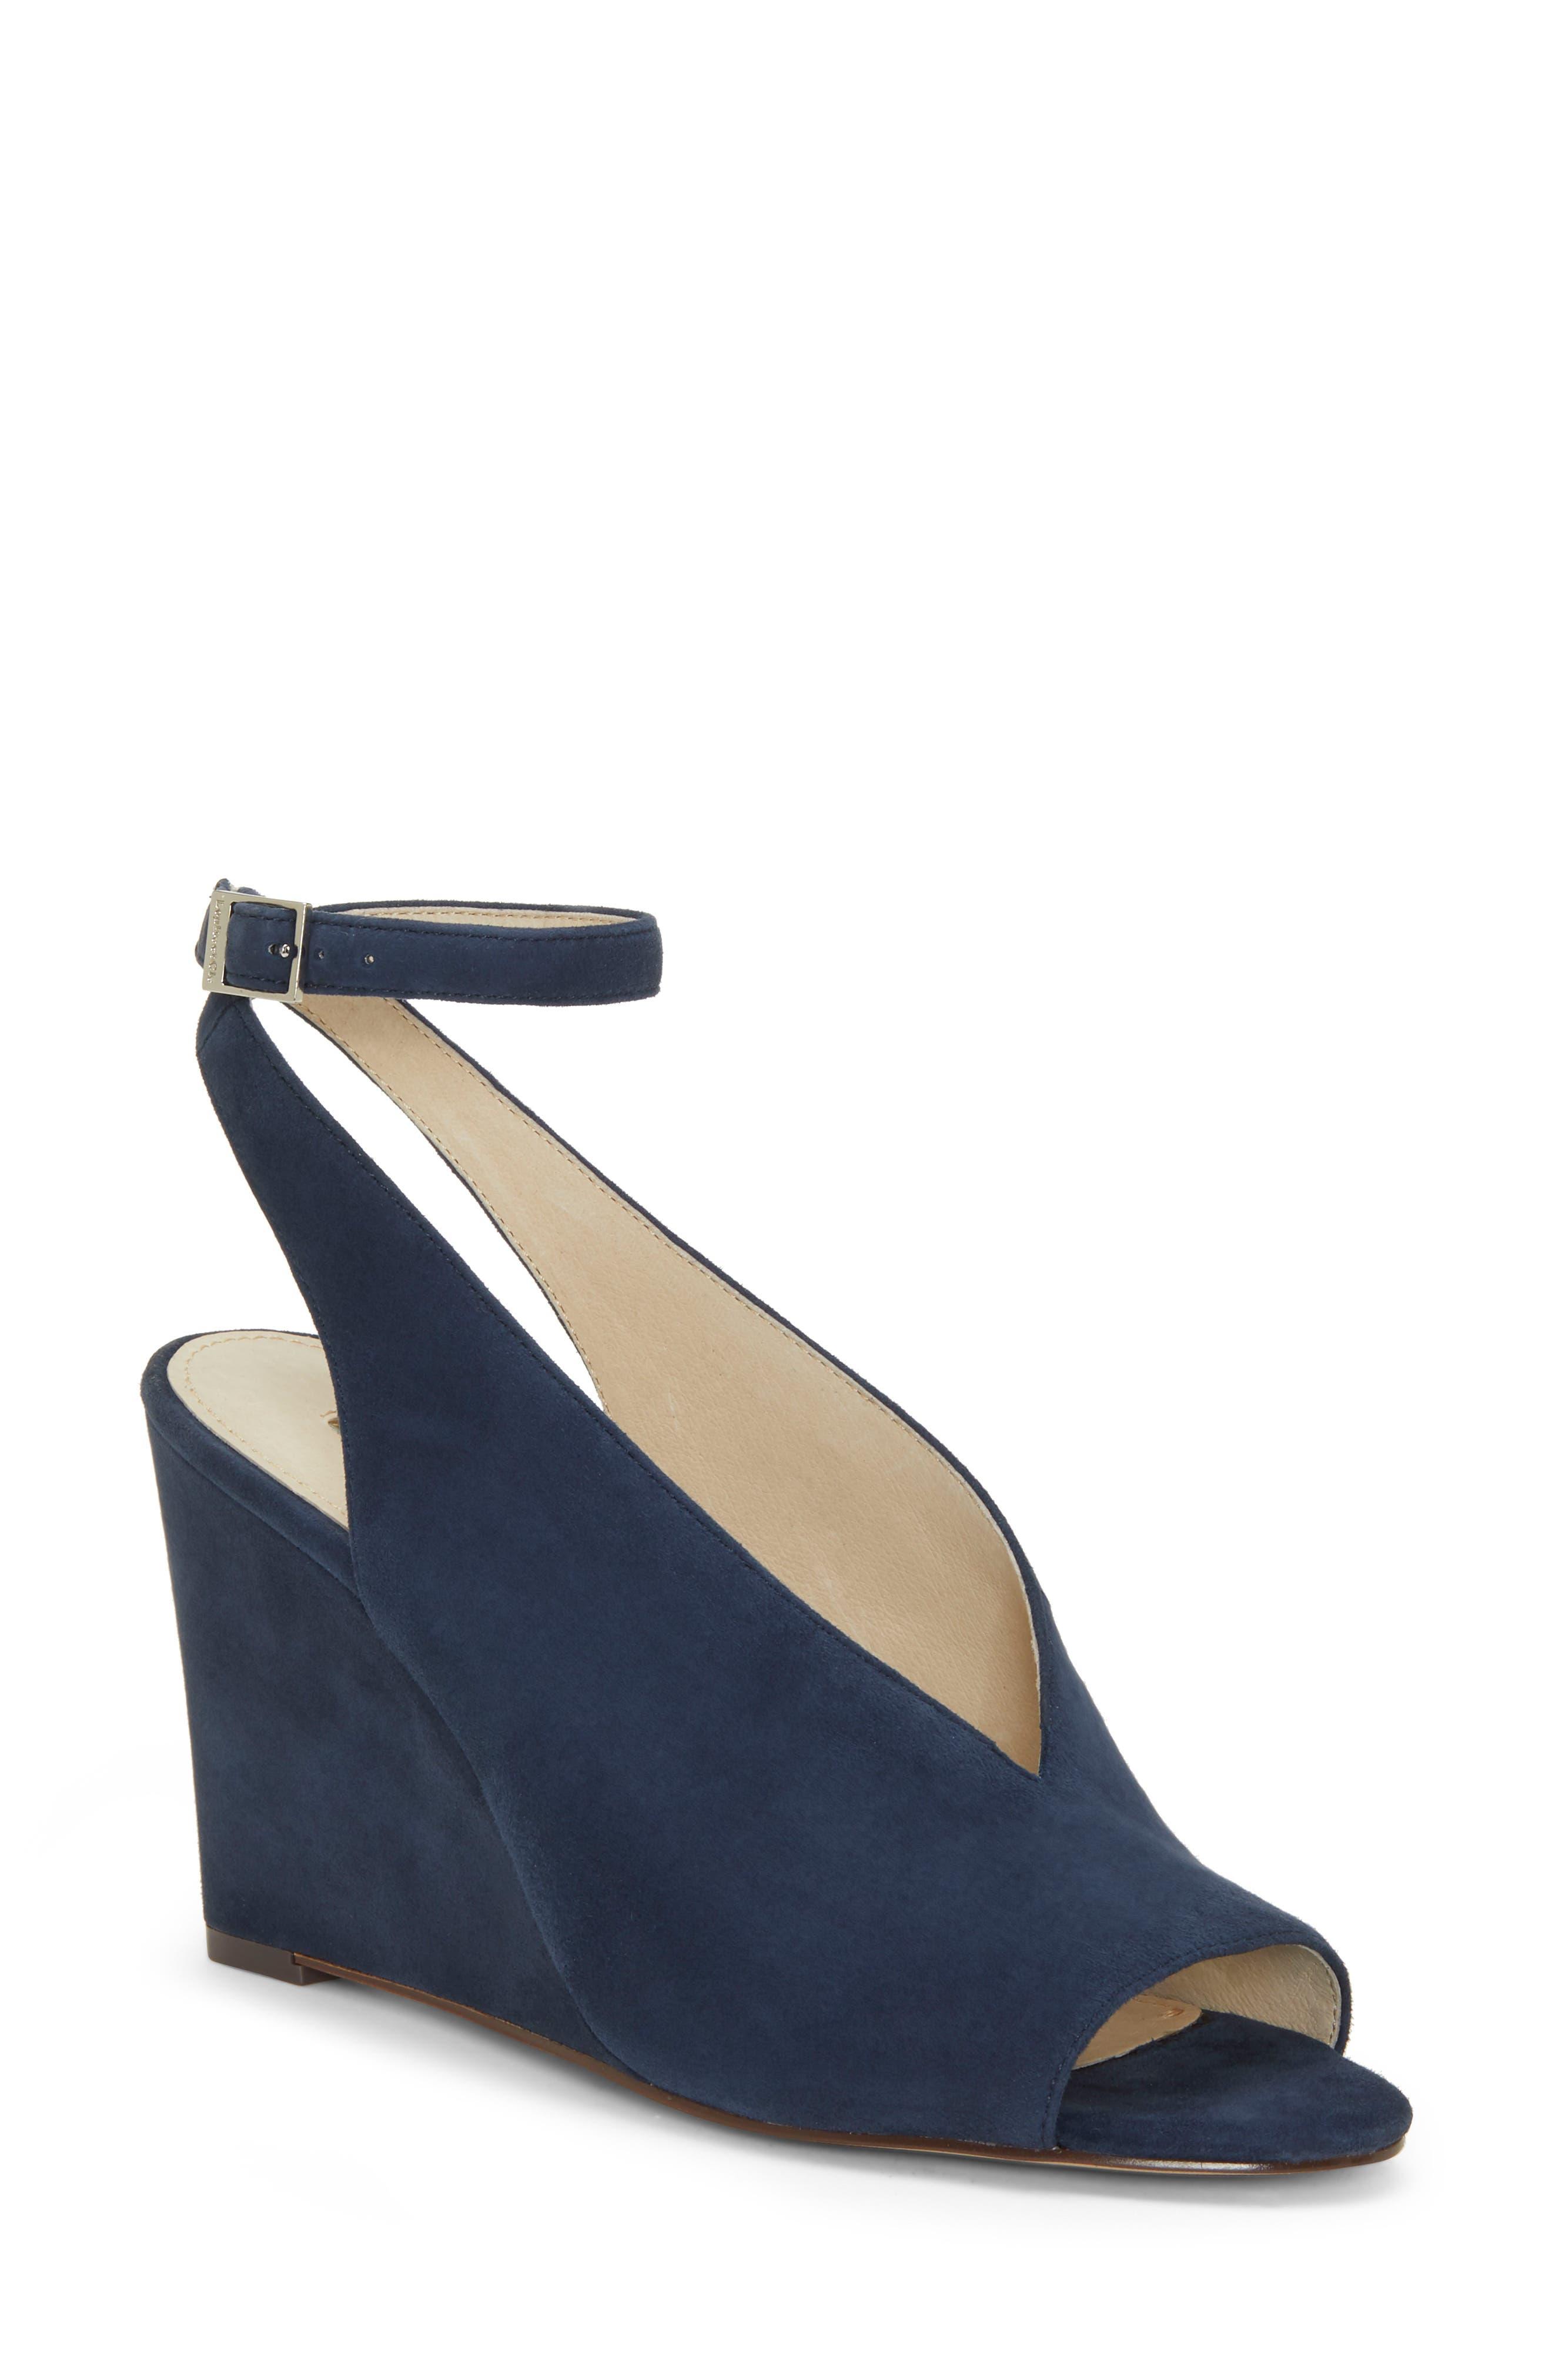 Louise Et Cie Ankle Strap Wedge Sandal, Blue